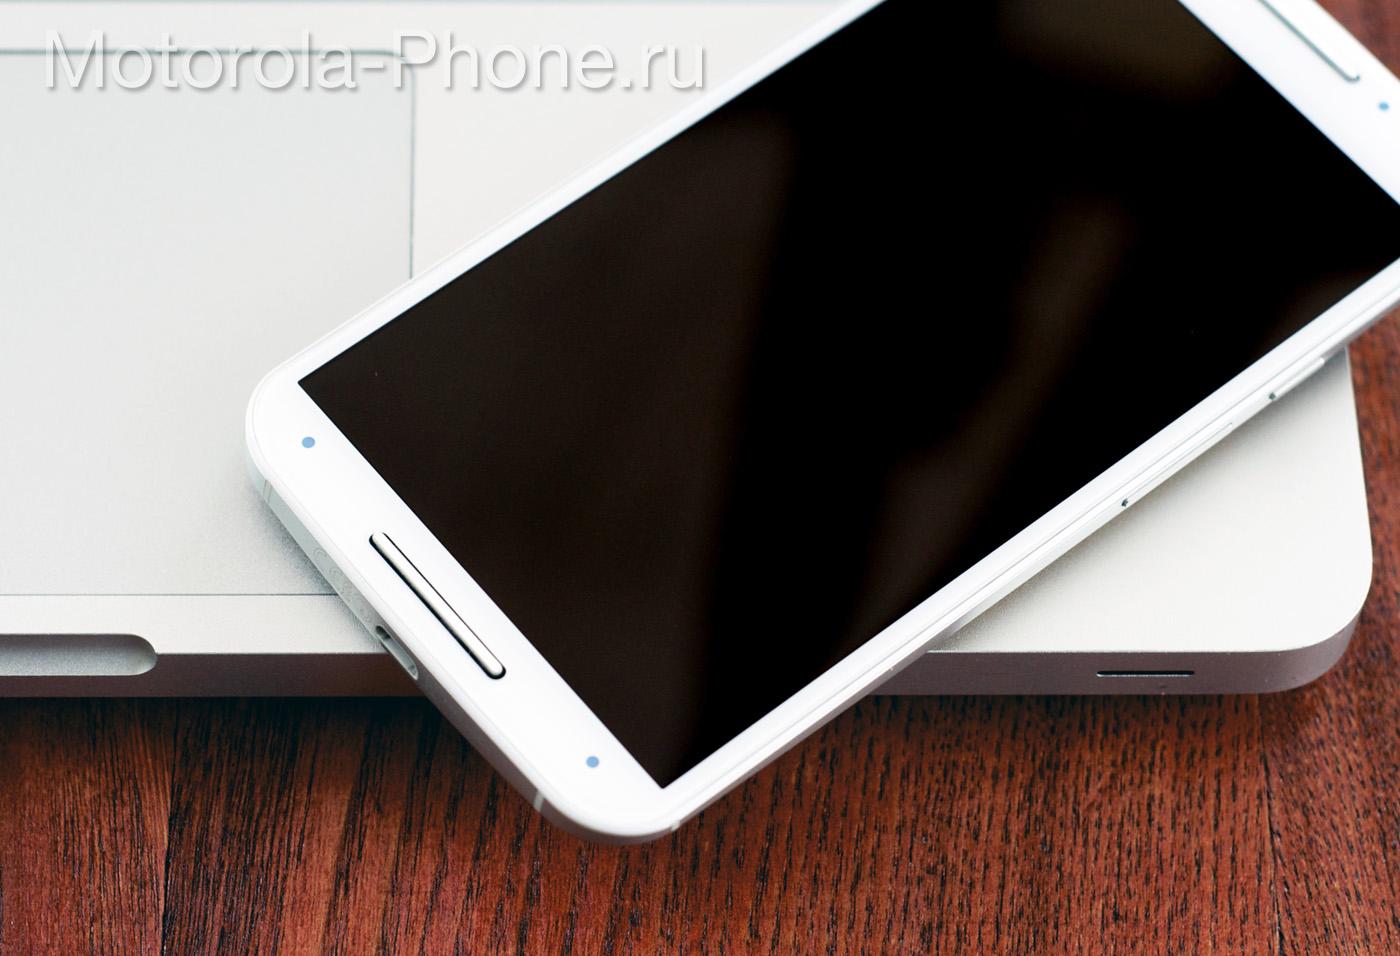 Motorola-Moto-X-10